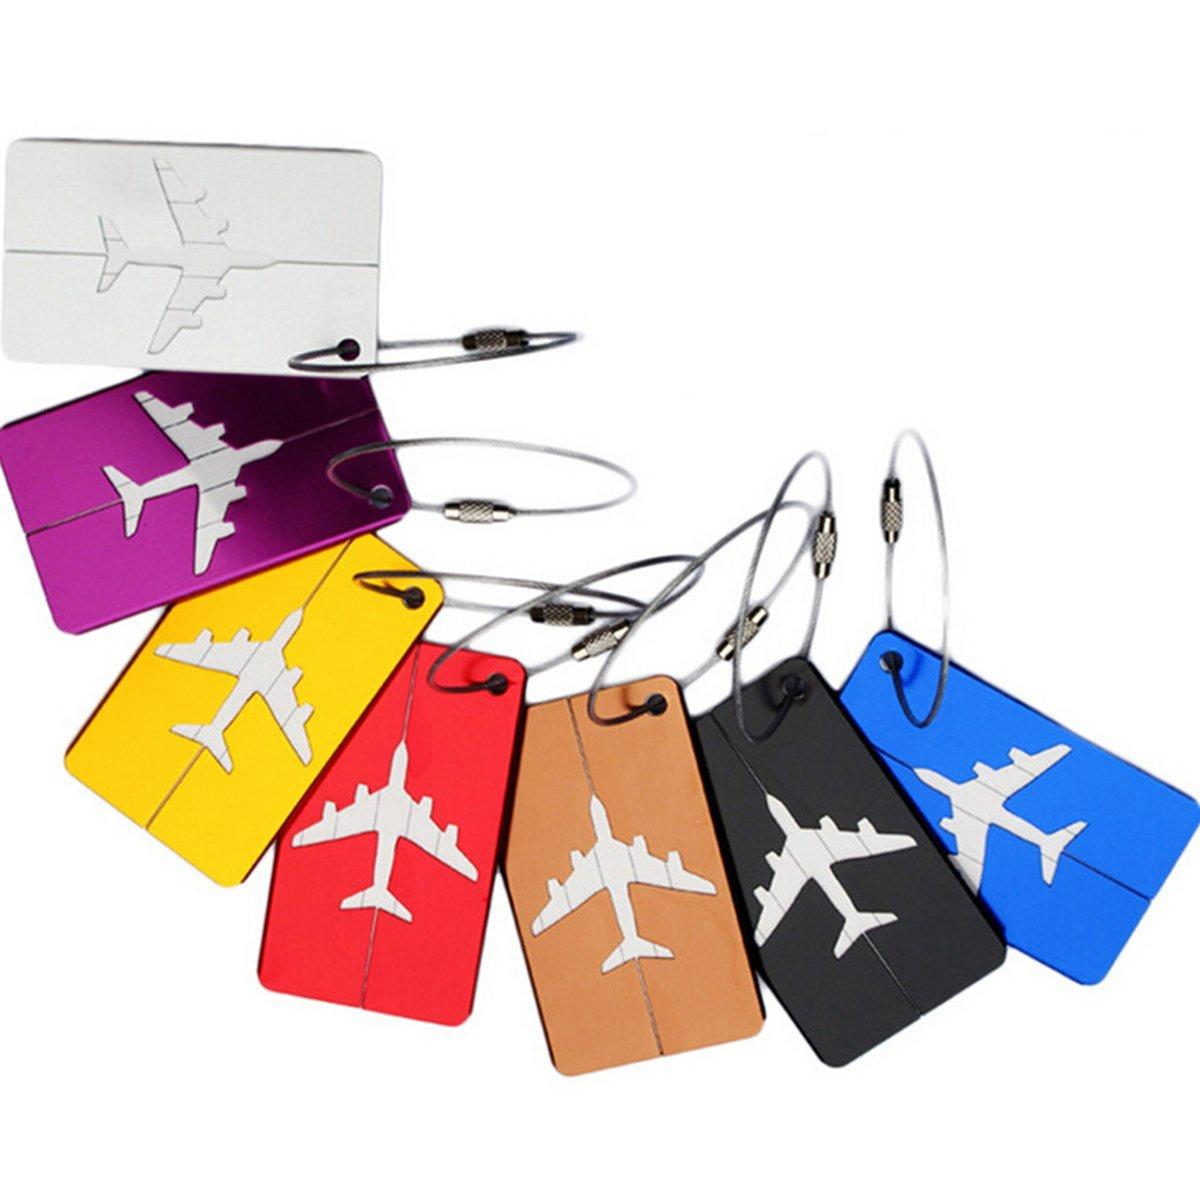 Tinksky Aluminum Airplane Pattern Travel Luggage Handbag Tag - 7 Colors